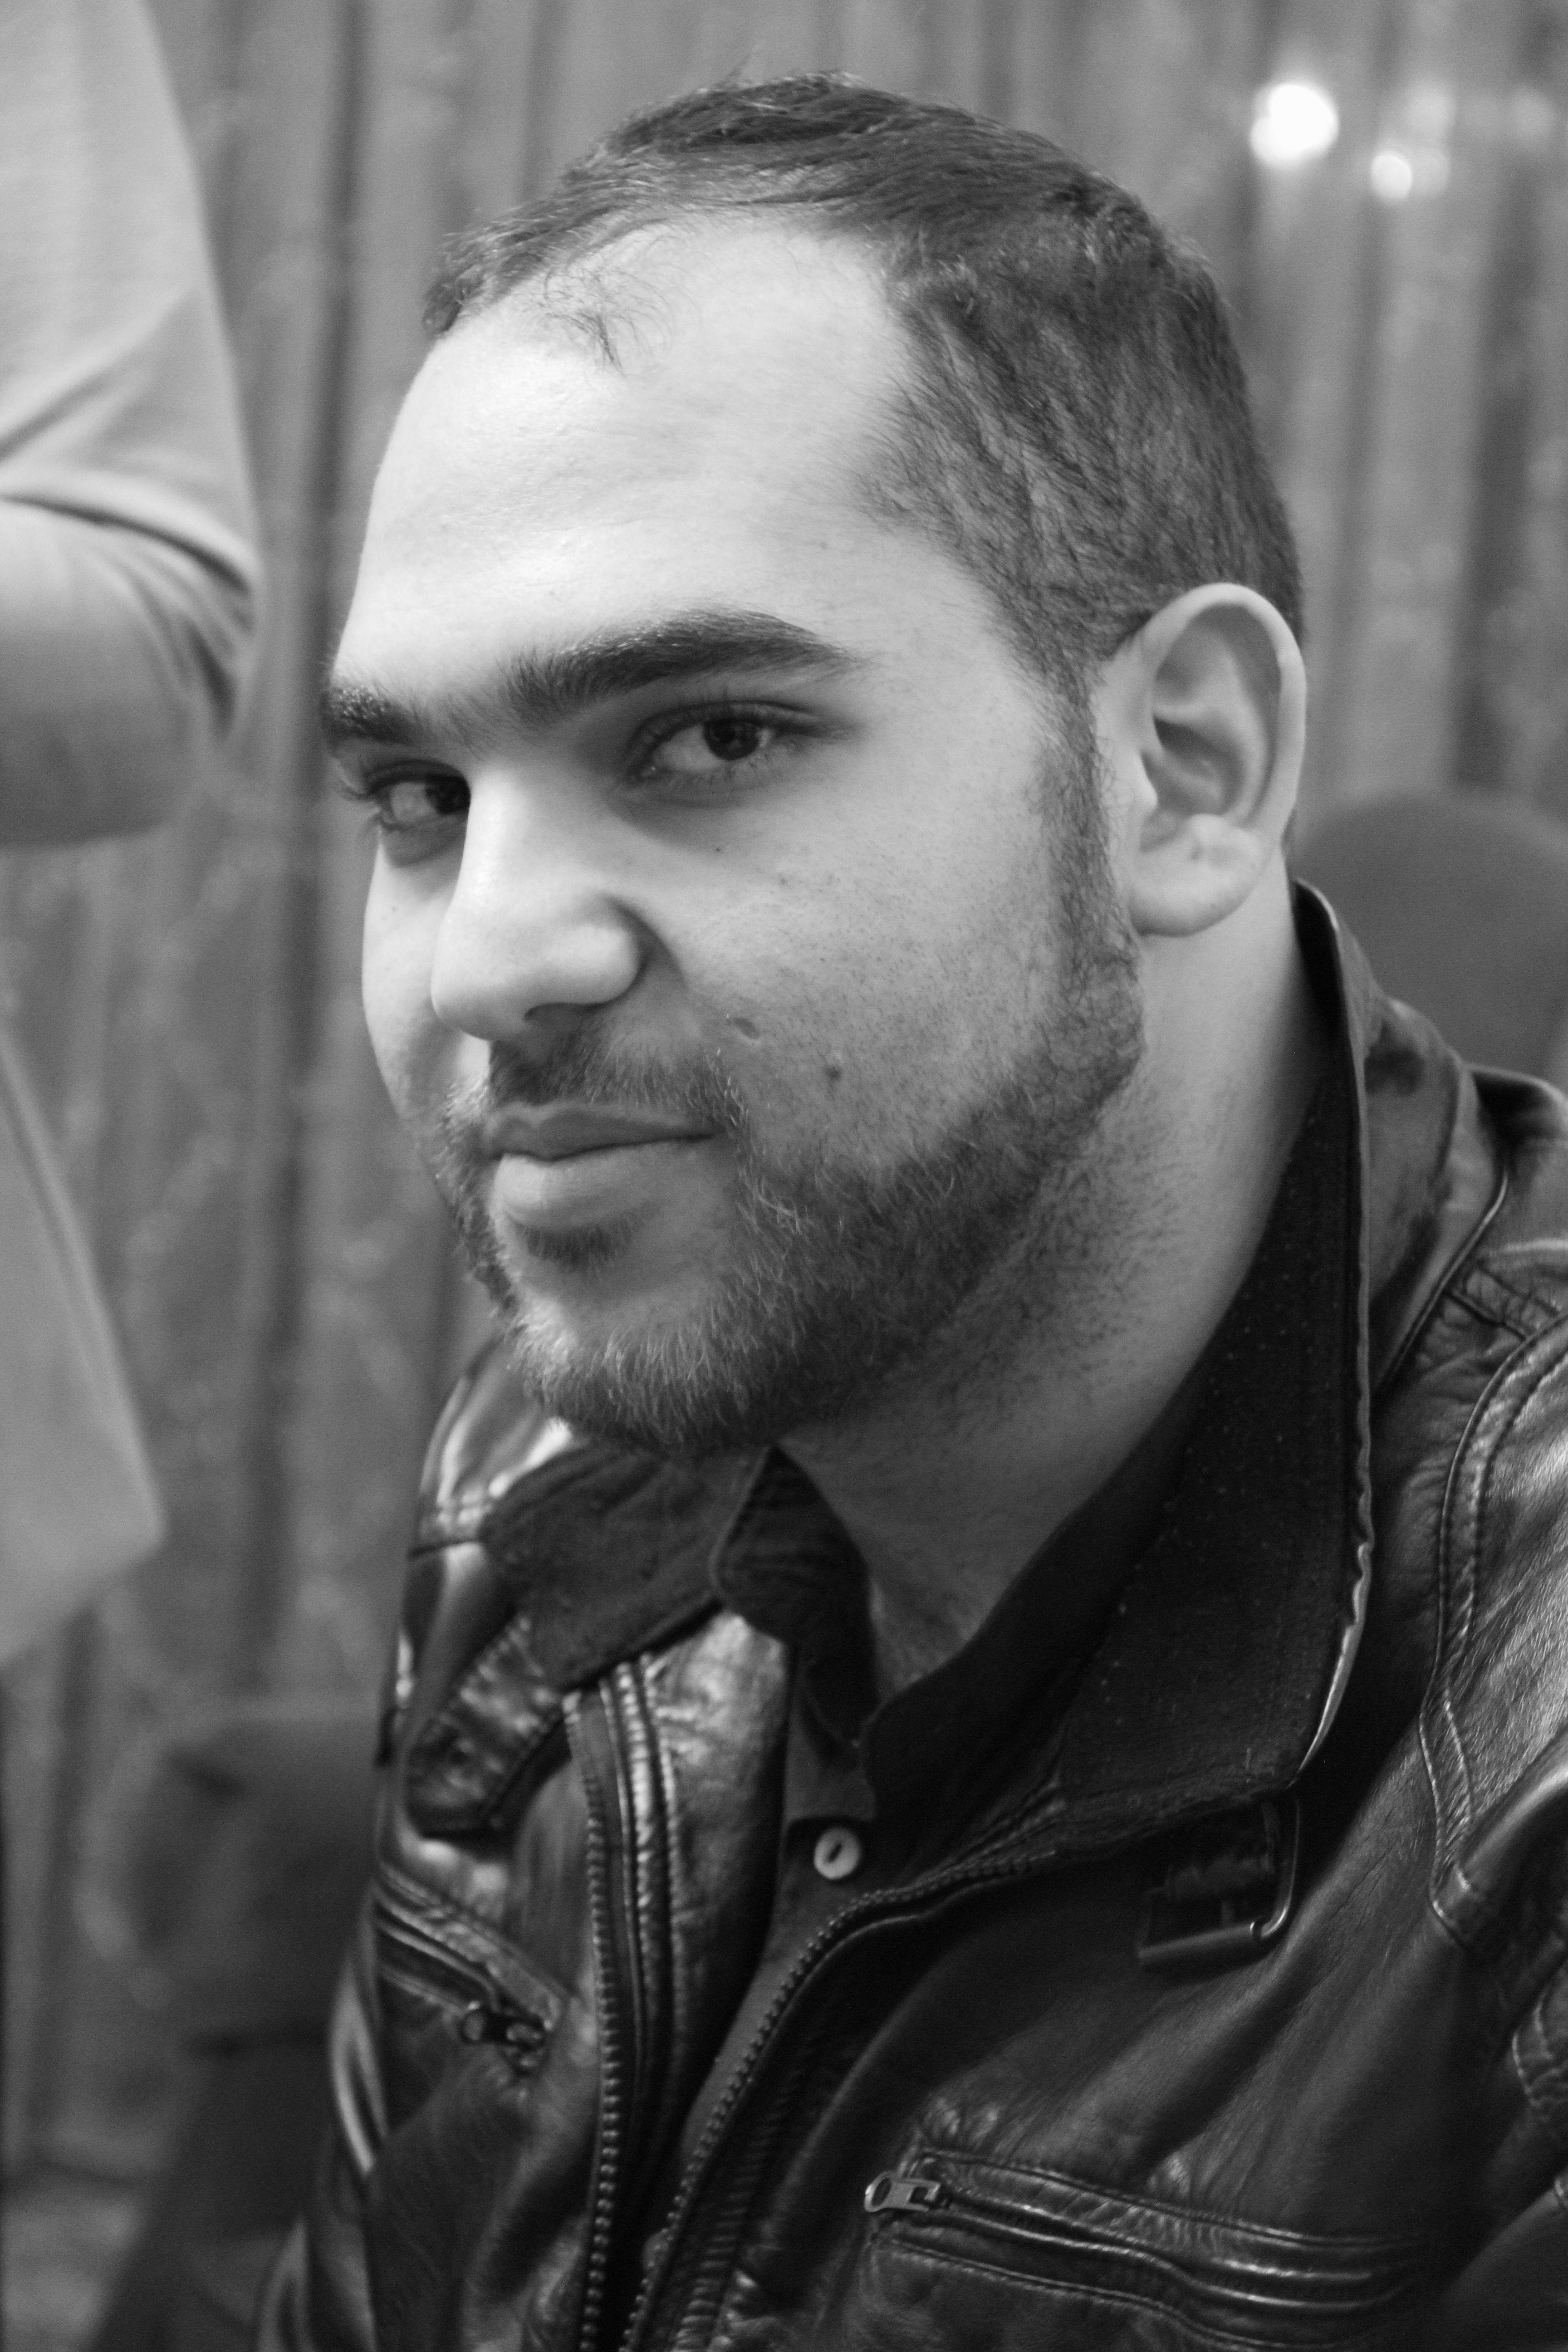 بلال موسى Headshot